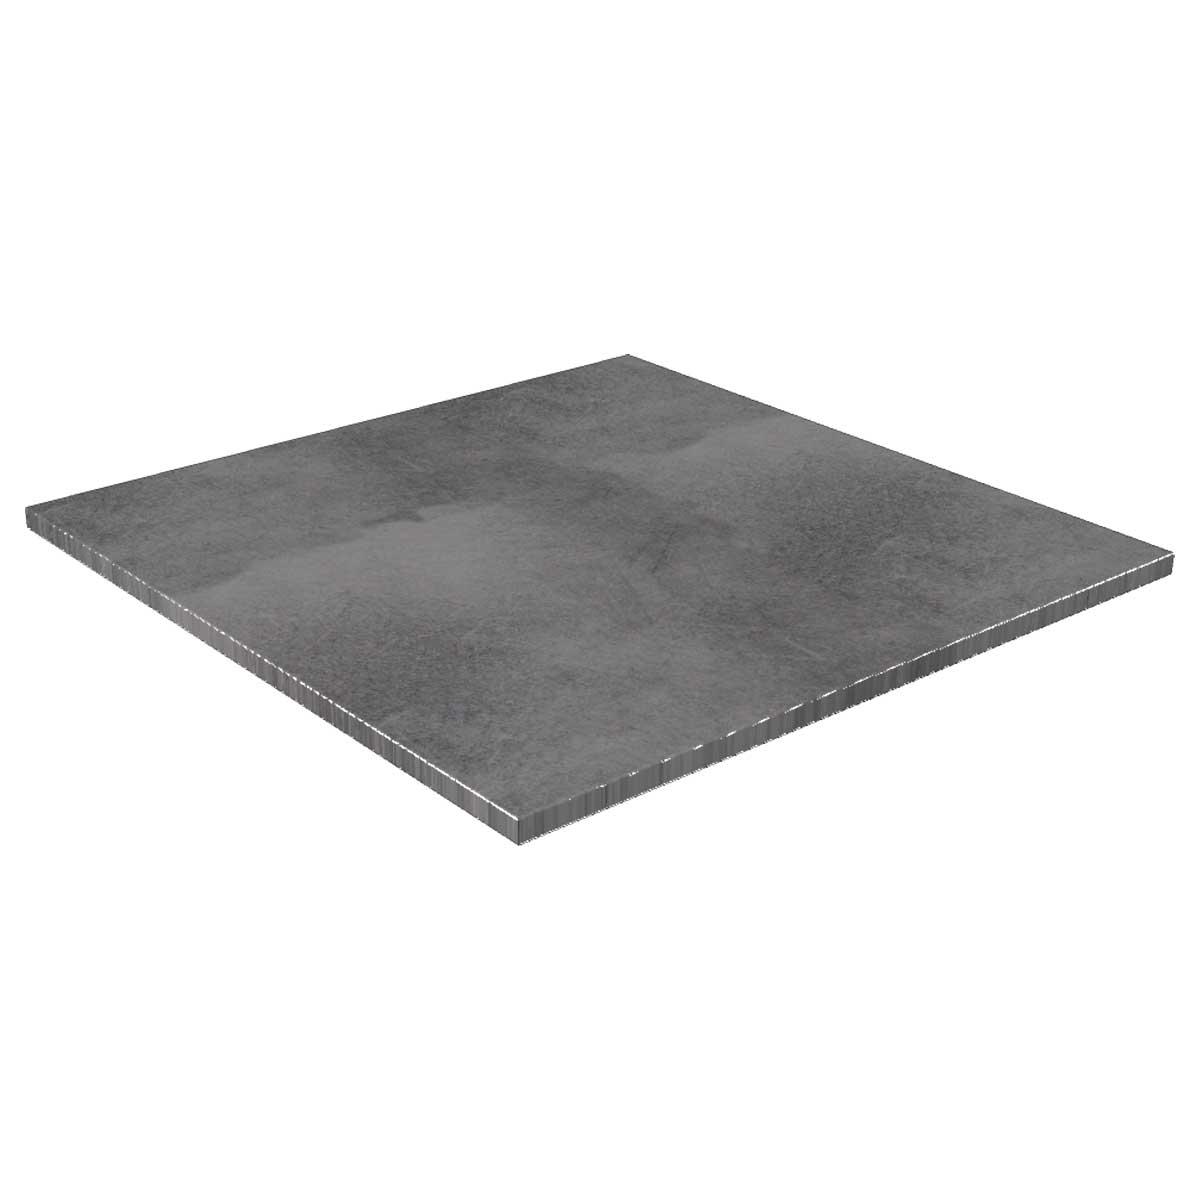 TICAM Q70 3192 - https://www.werzalit.com/en/product/table-top-cambium-q-70x70cm-board-thickness-39cm-decor-duesseldorf/